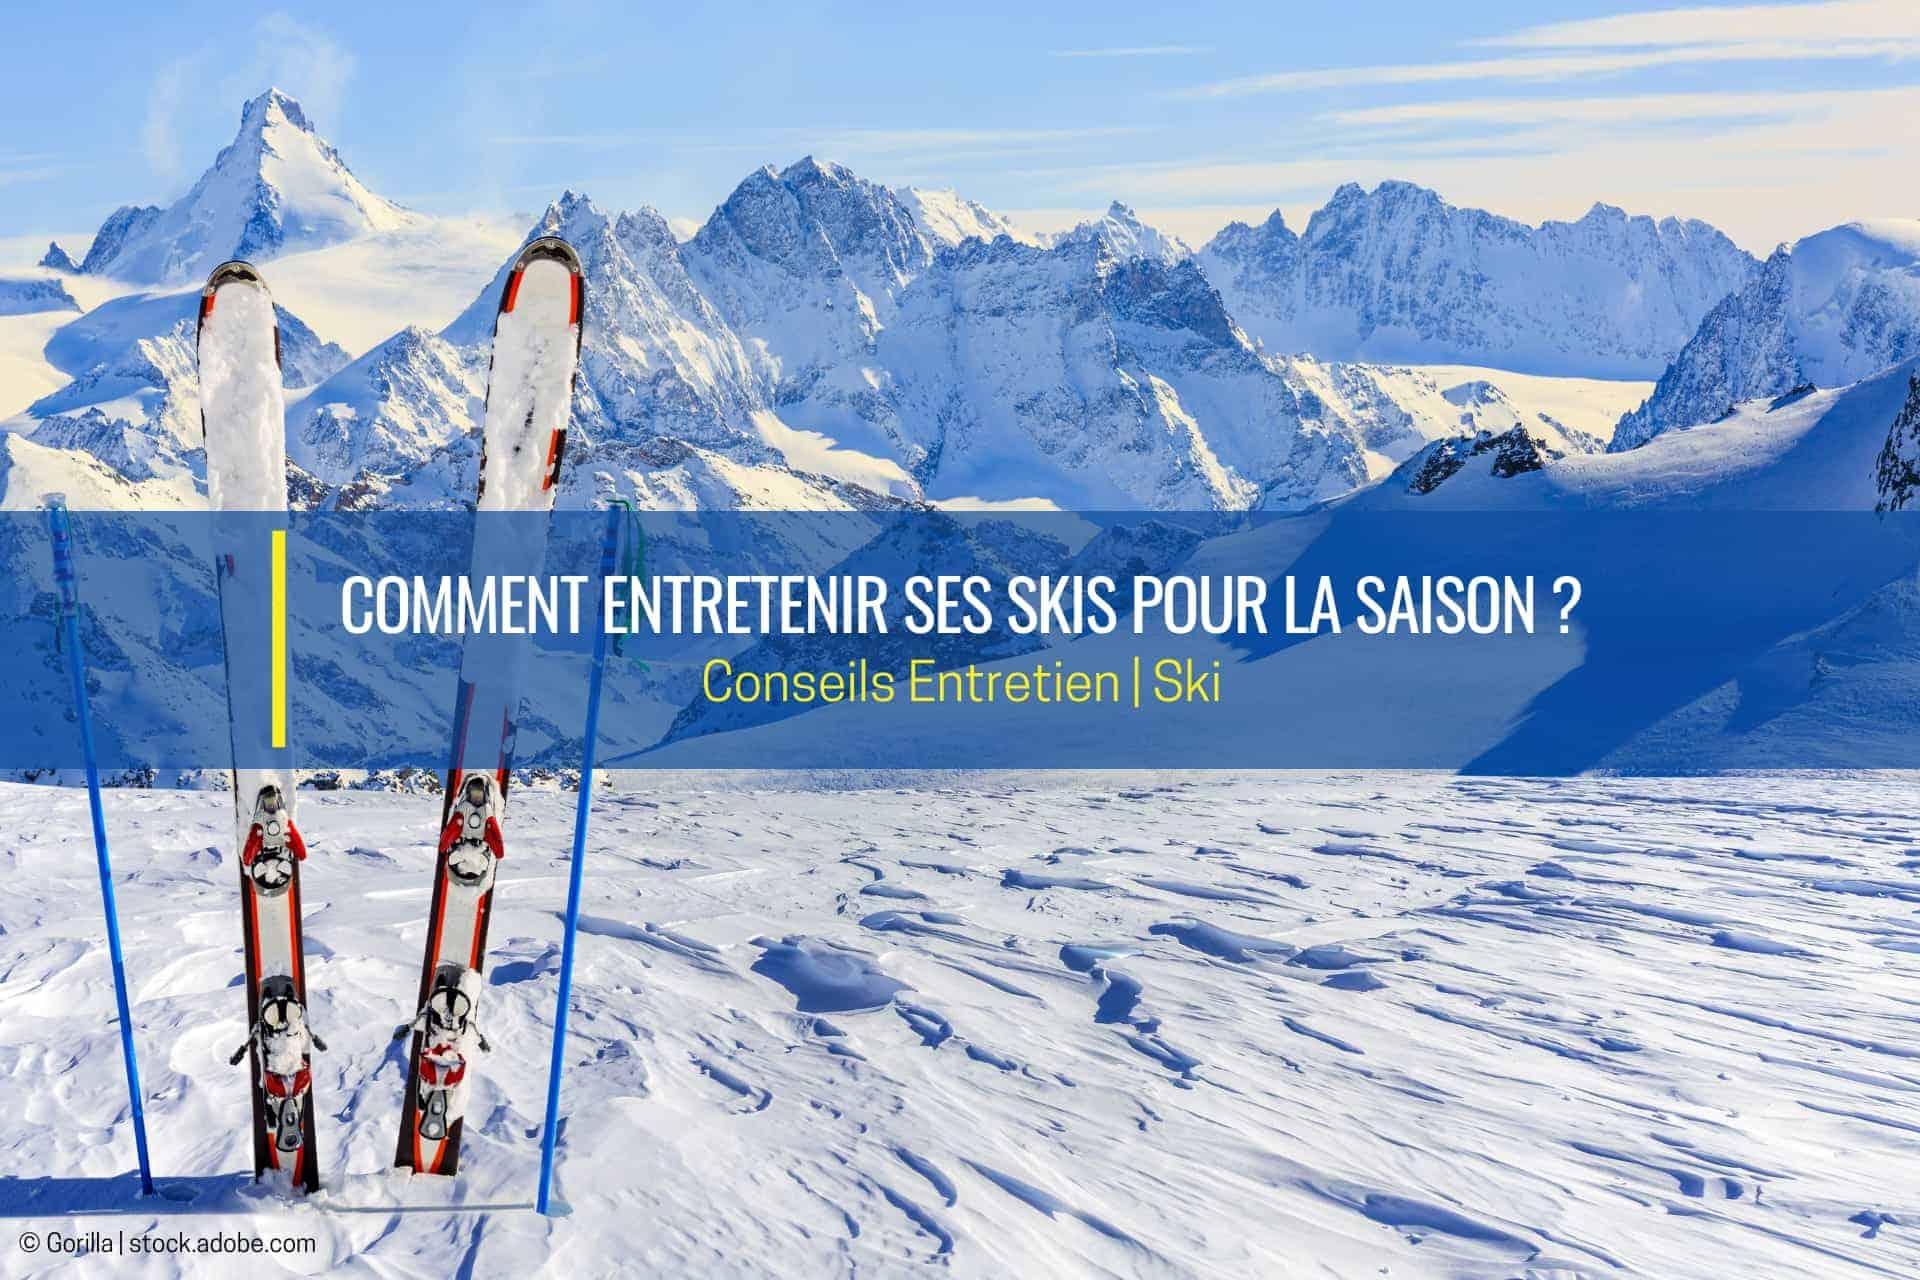 entretenir ses skis